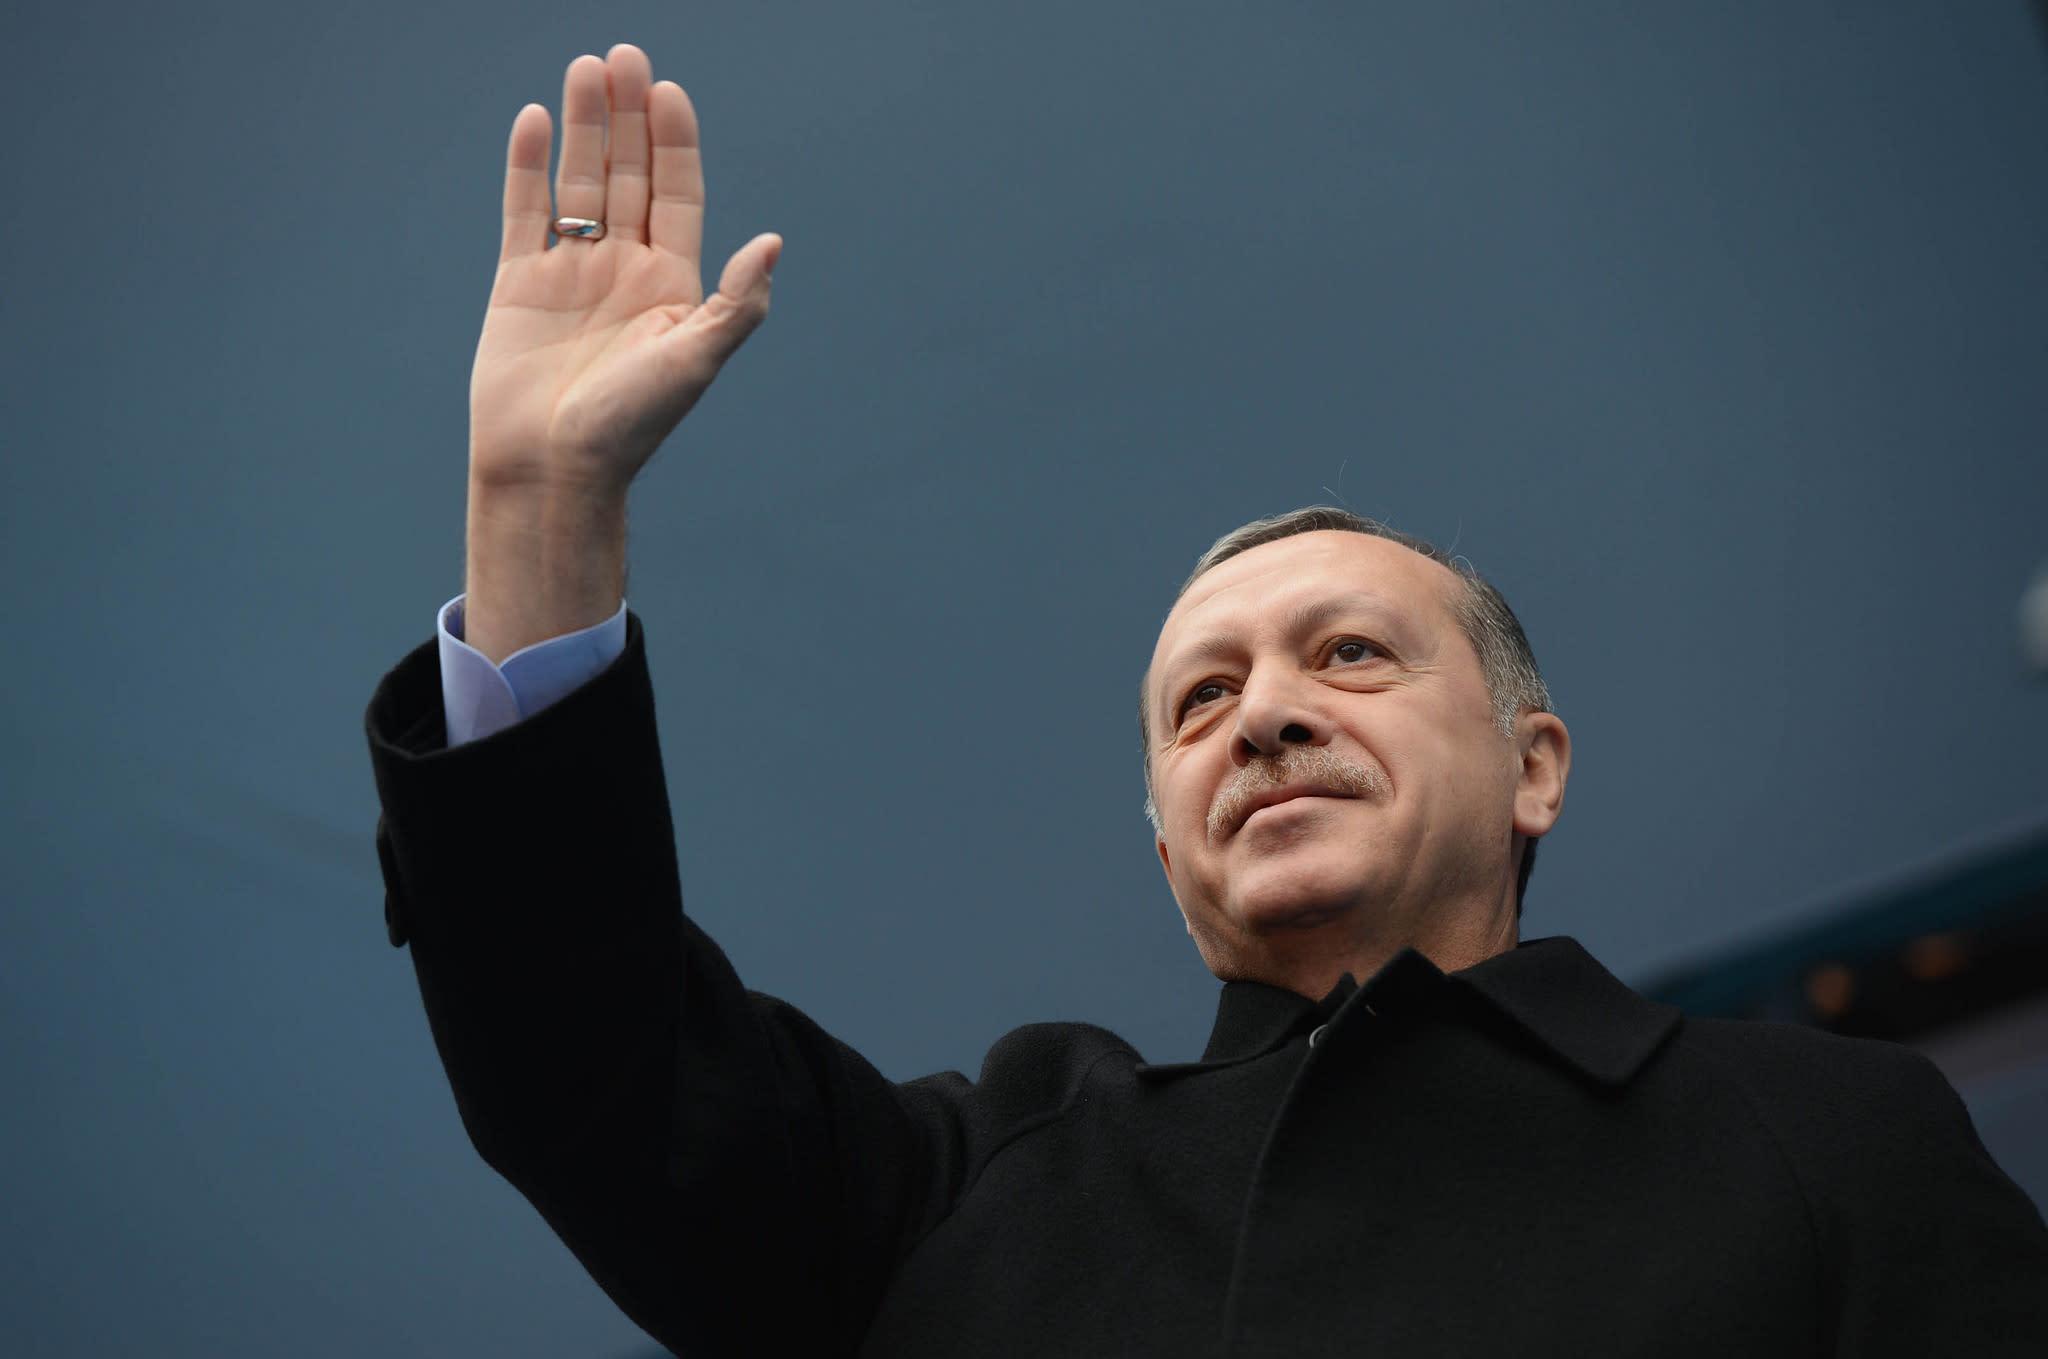 Turkey blocks Facebook, Twitter, WhatsApp after arrest of opposition leaders